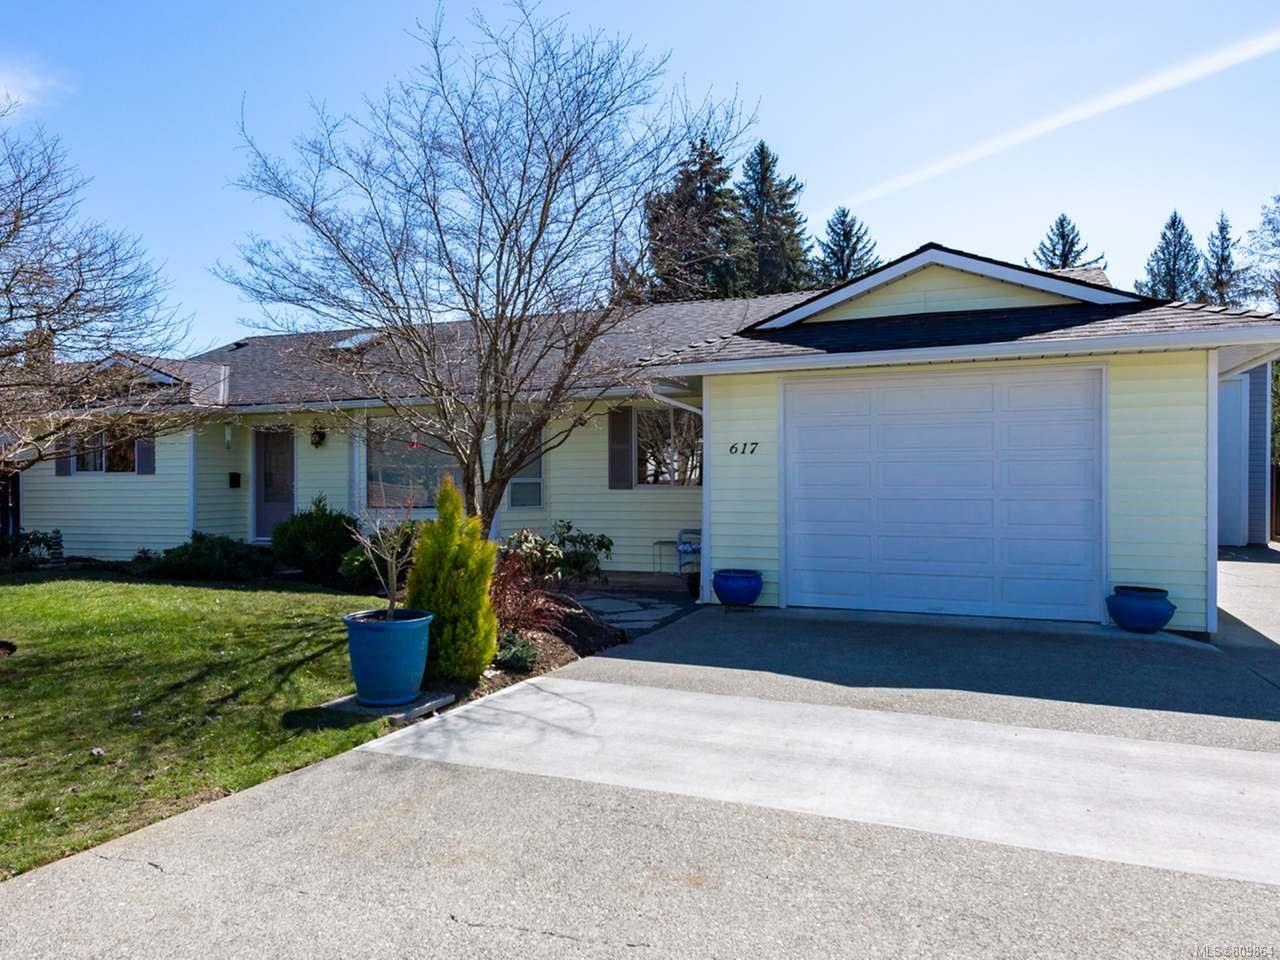 Main Photo: 617 Springbok Rd in CAMPBELL RIVER: CR Campbell River Central House for sale (Campbell River)  : MLS®# 809864